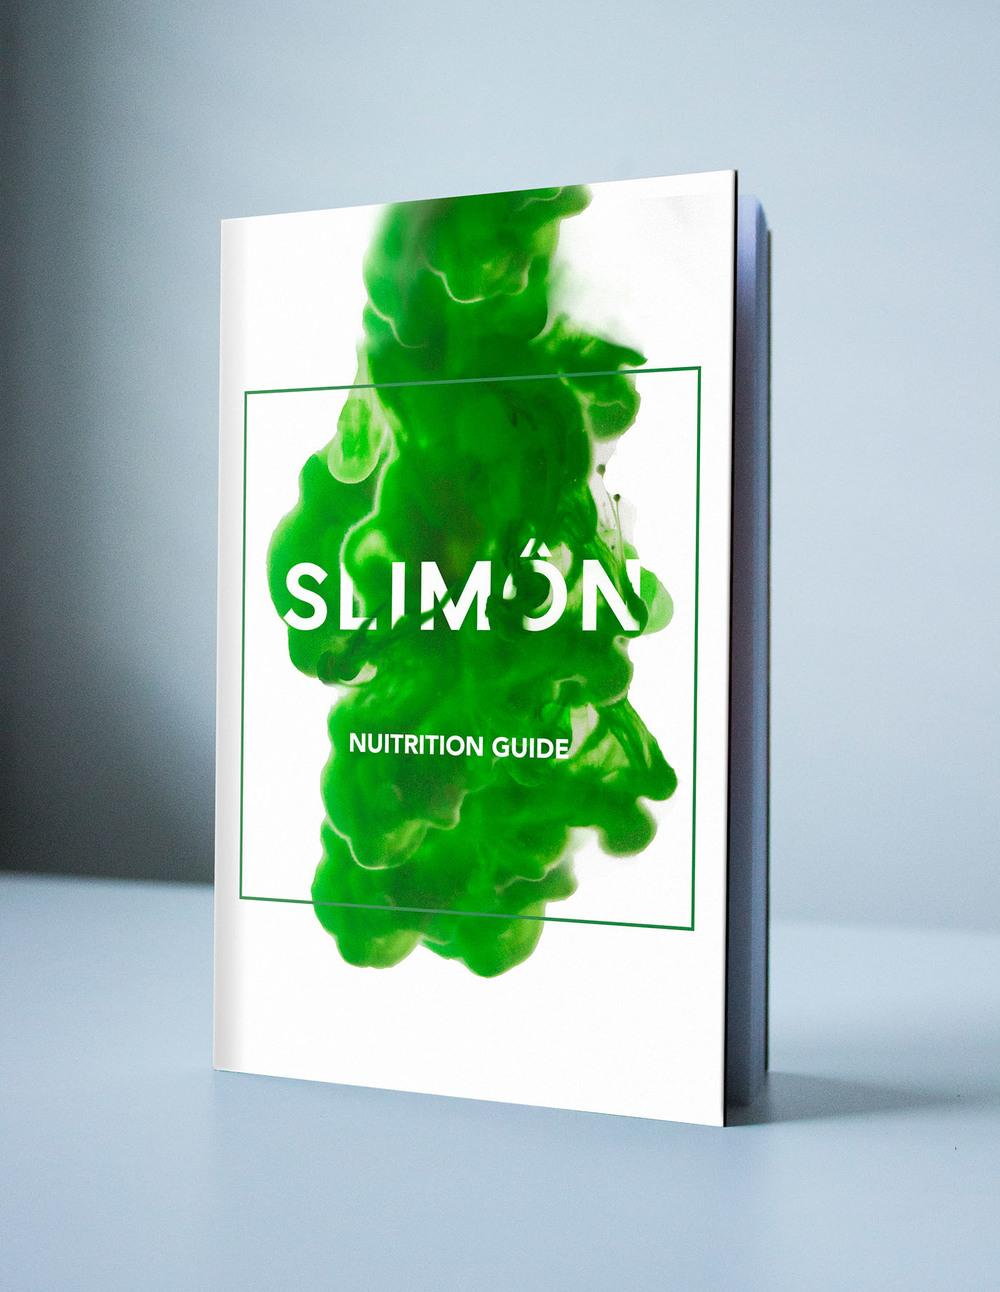 slimon-solid-white-book.jpg